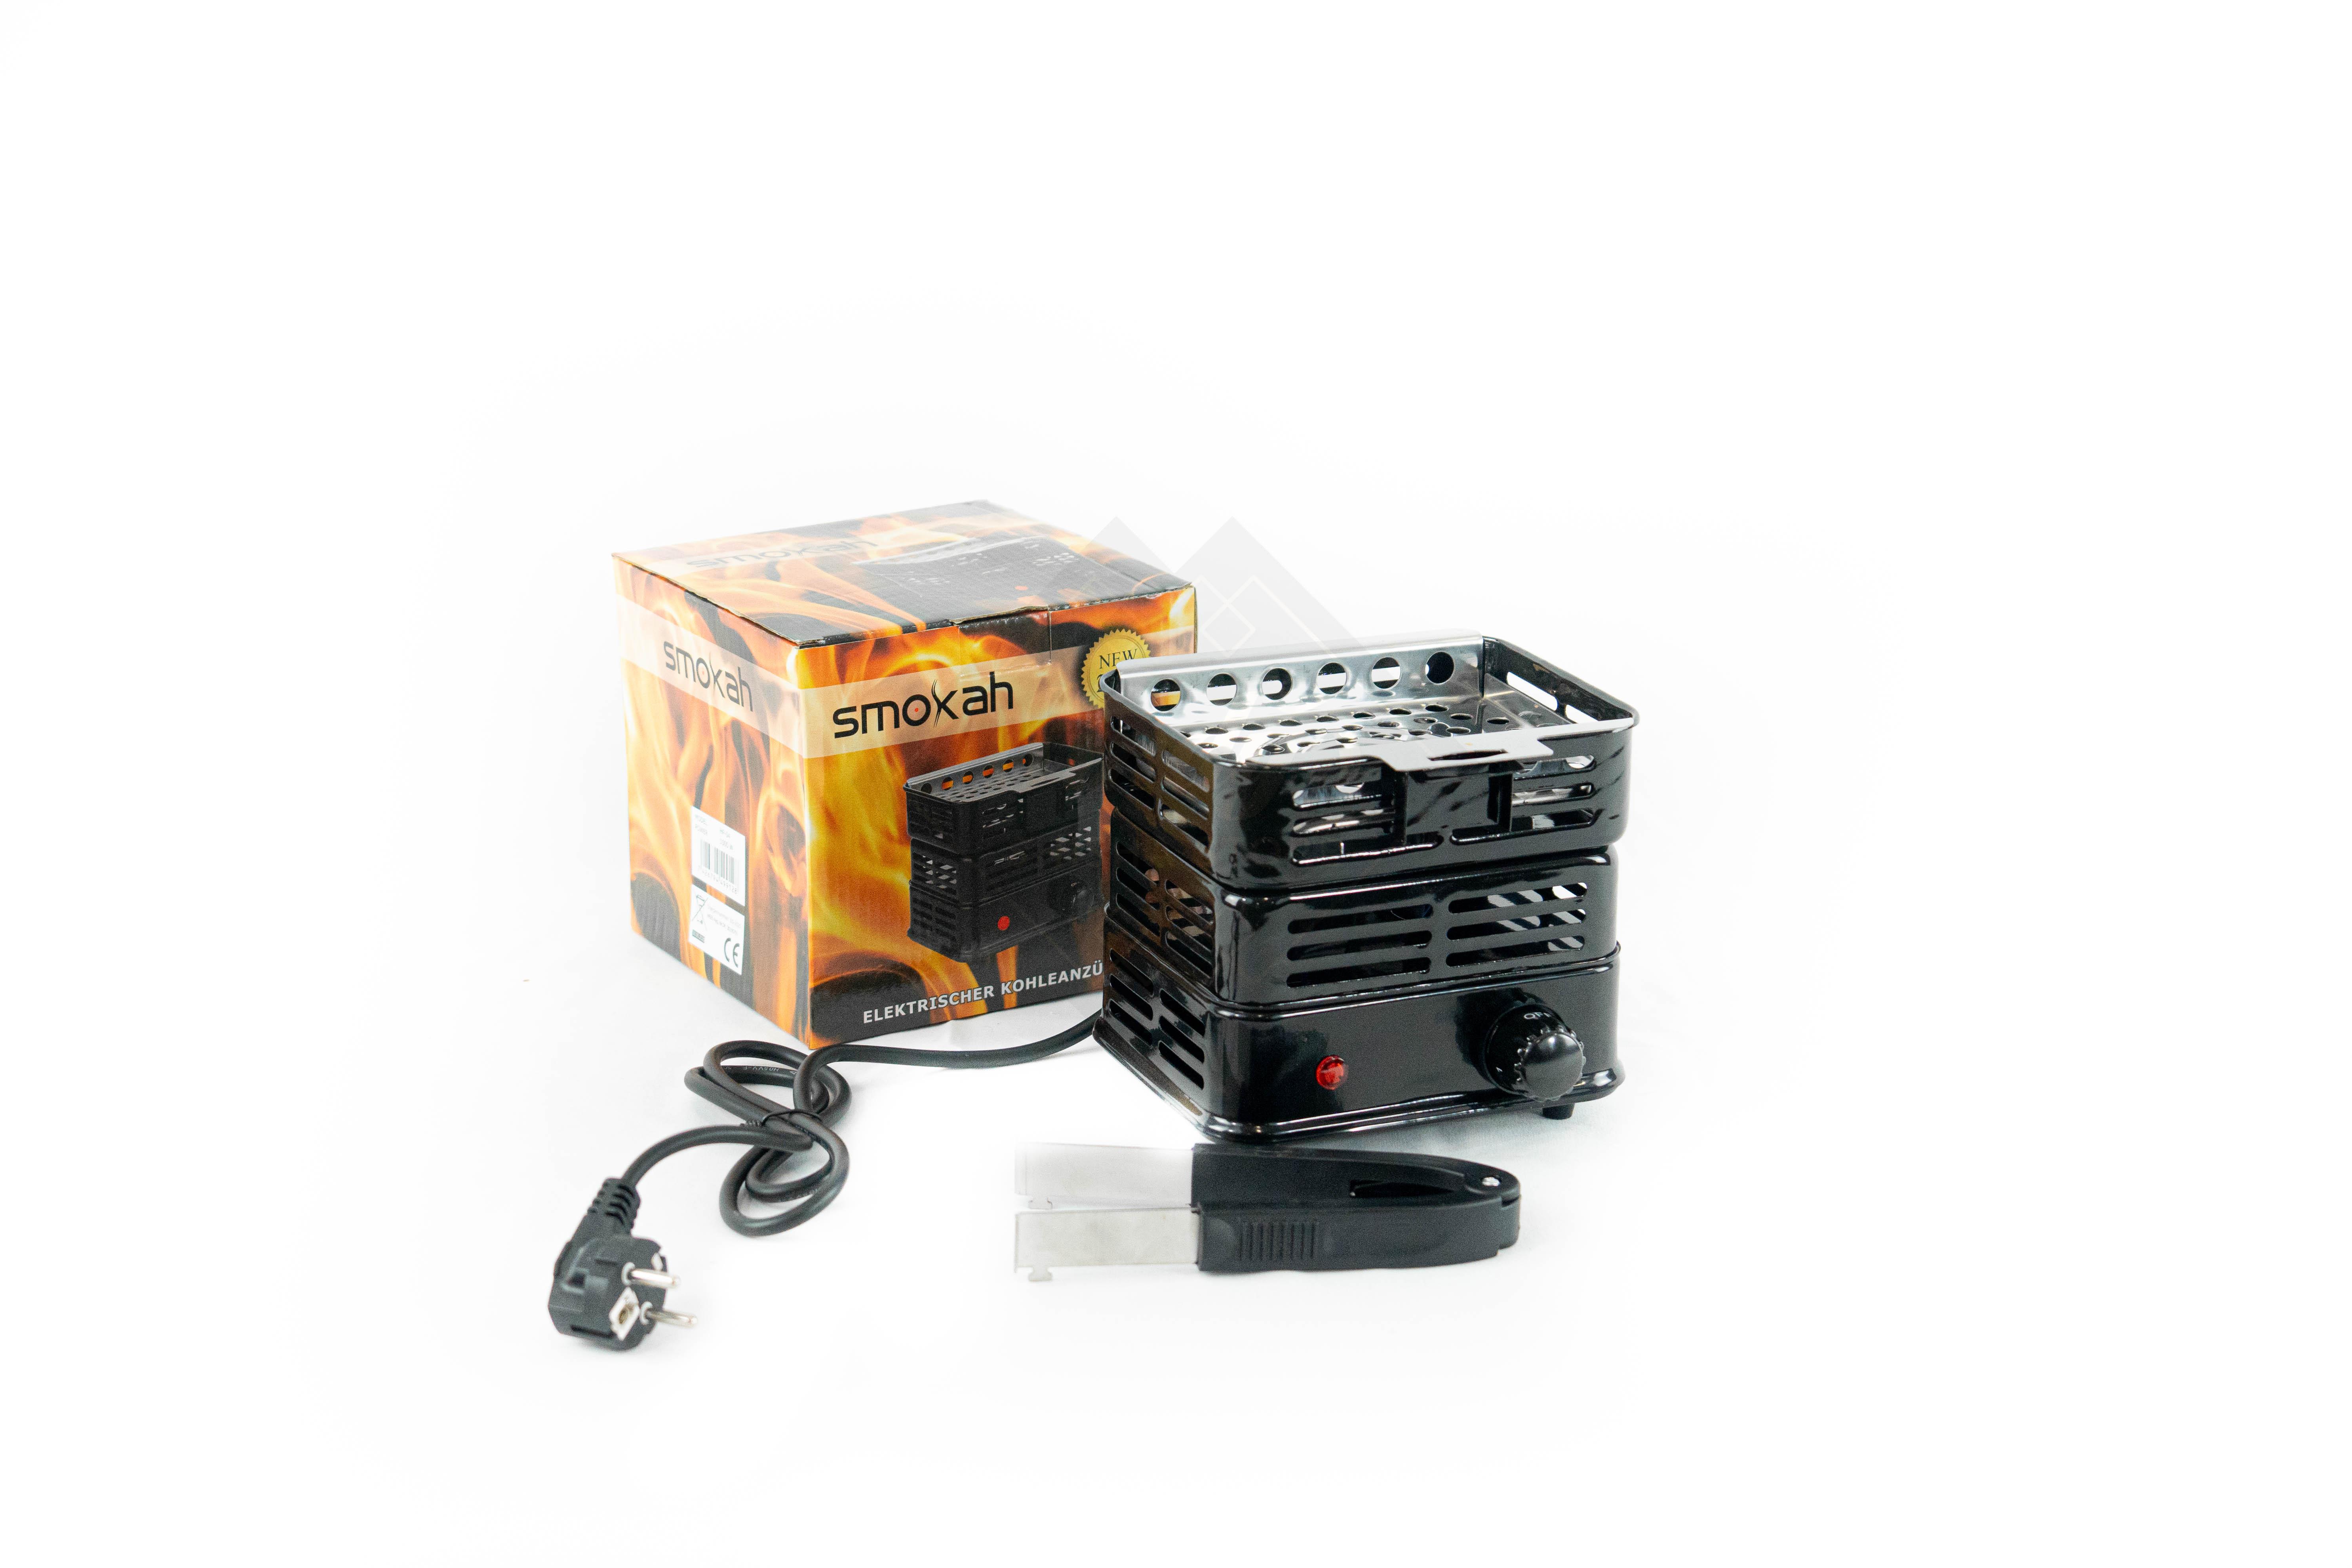 Smokah Kohleanzünder Elektrisch 800 Watt HP-04